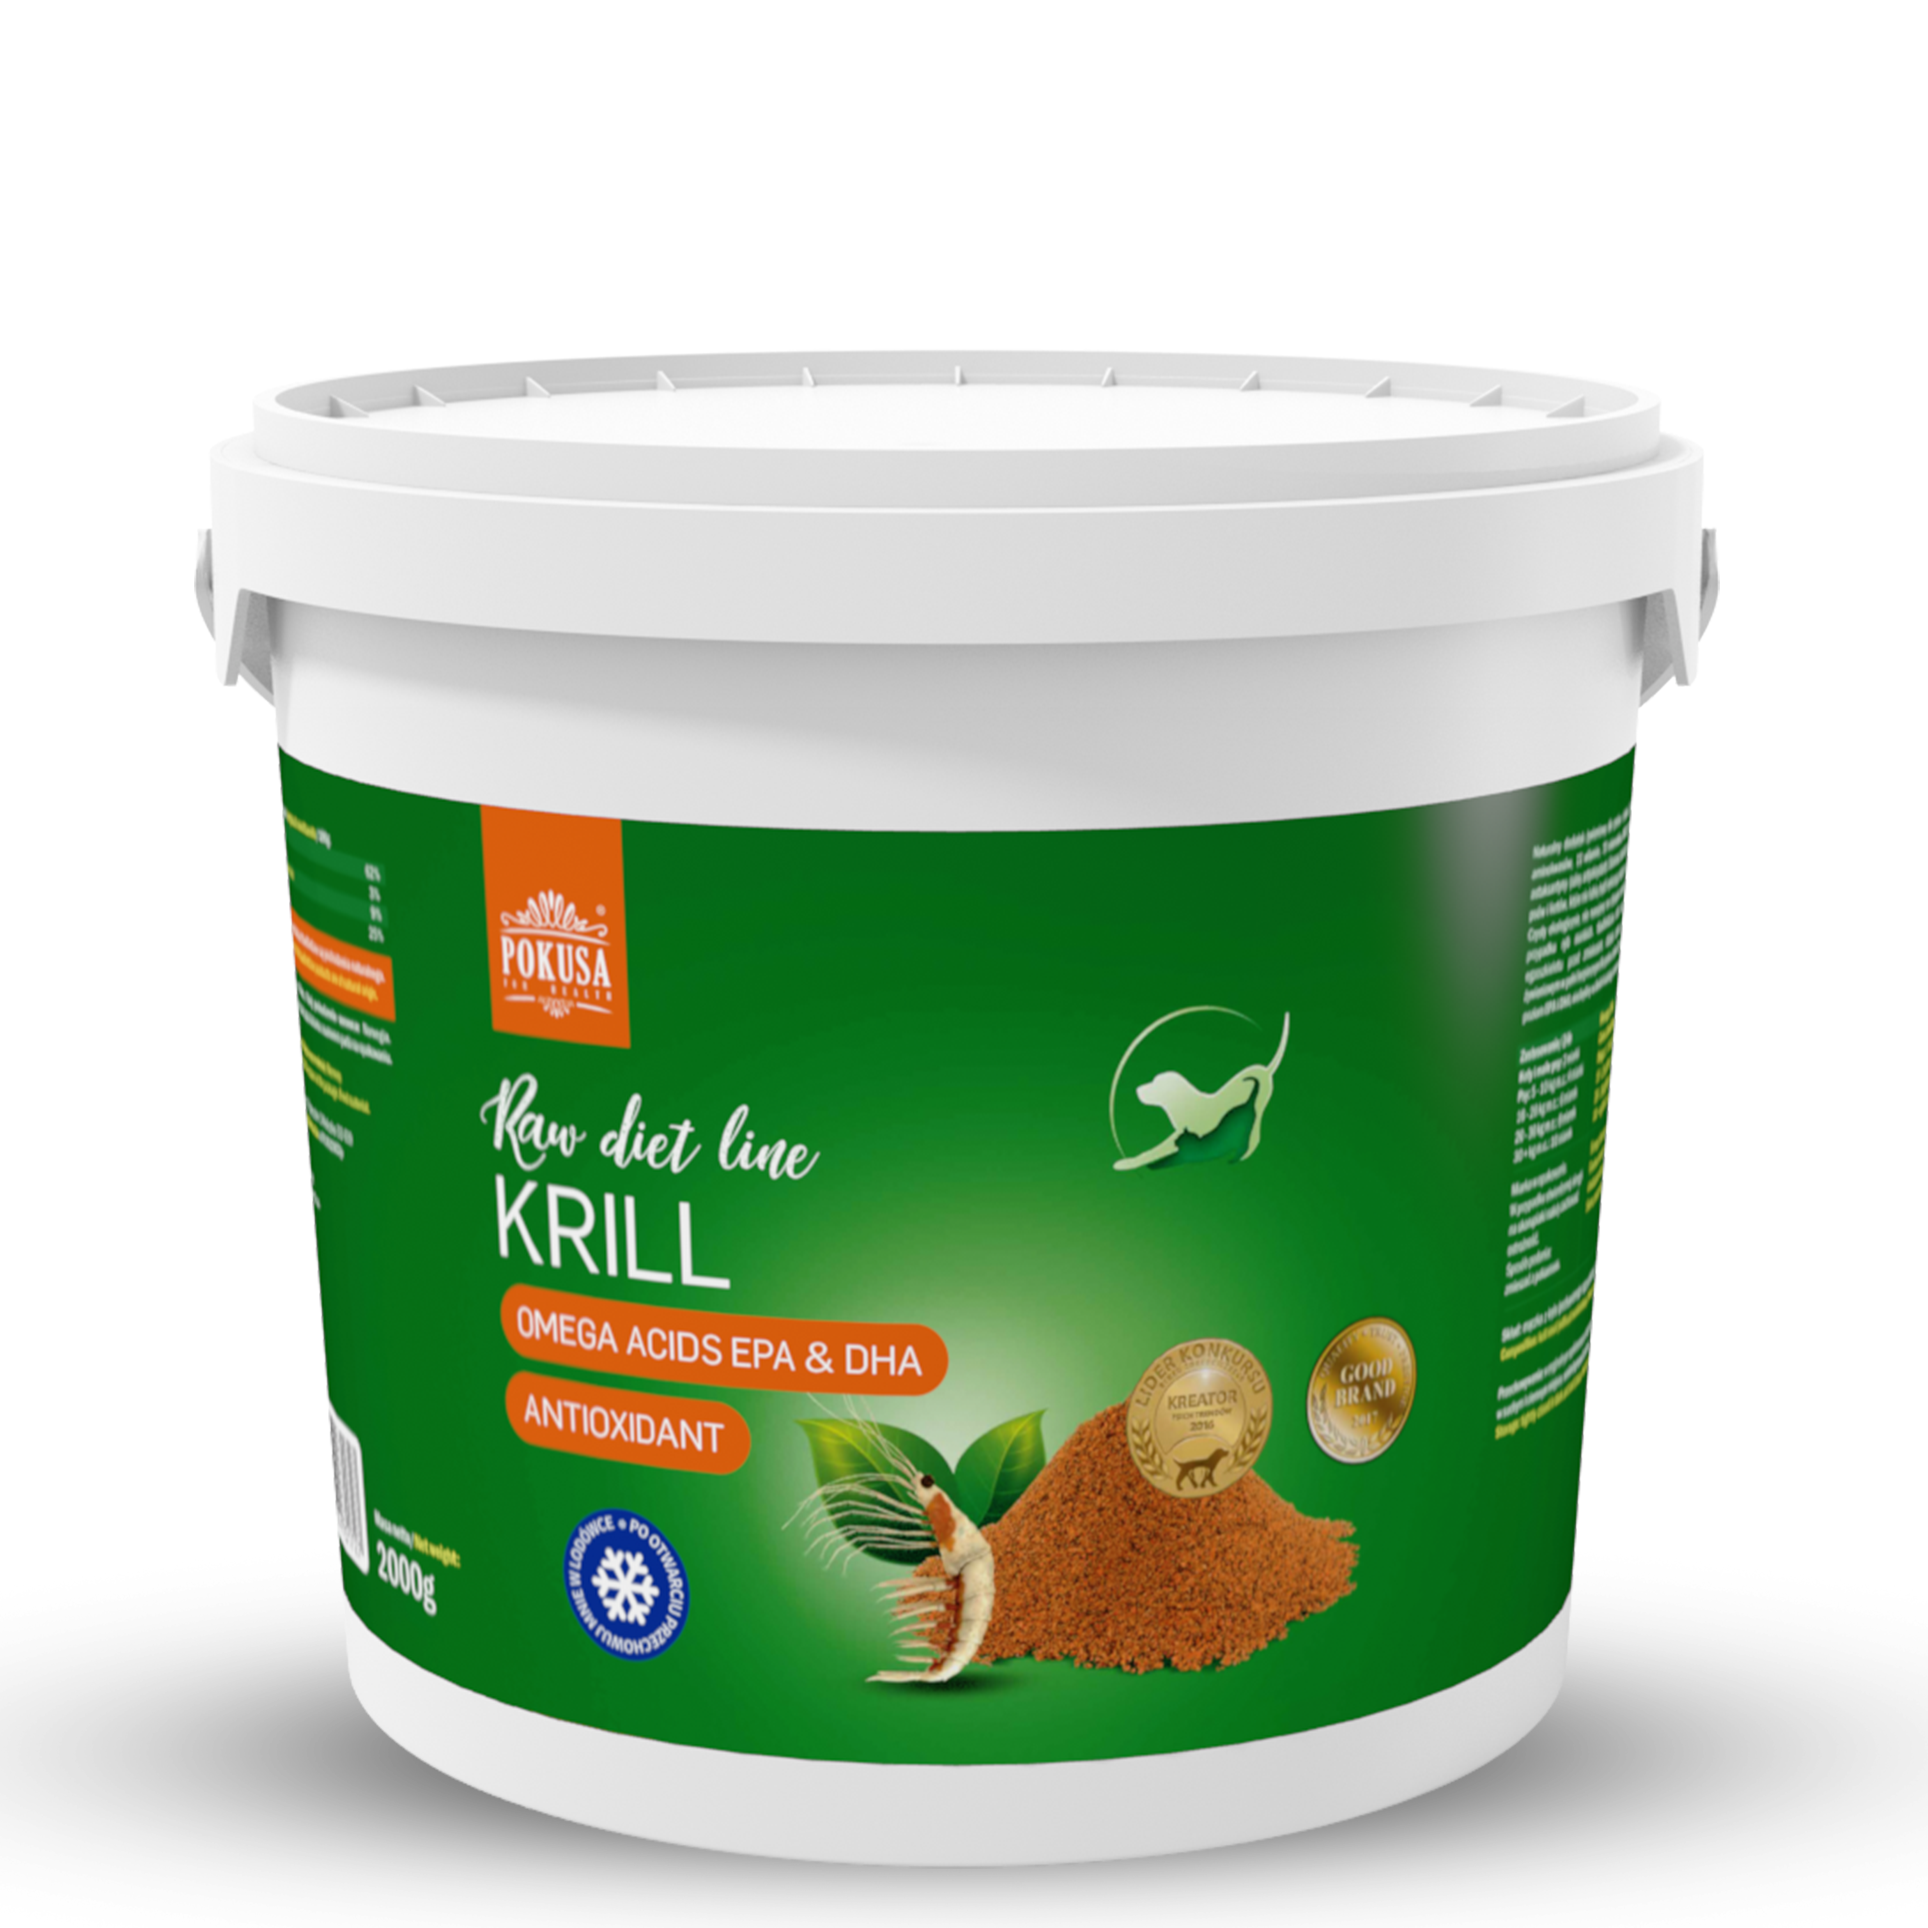 Pokusa RawDietLine Krill 2000g